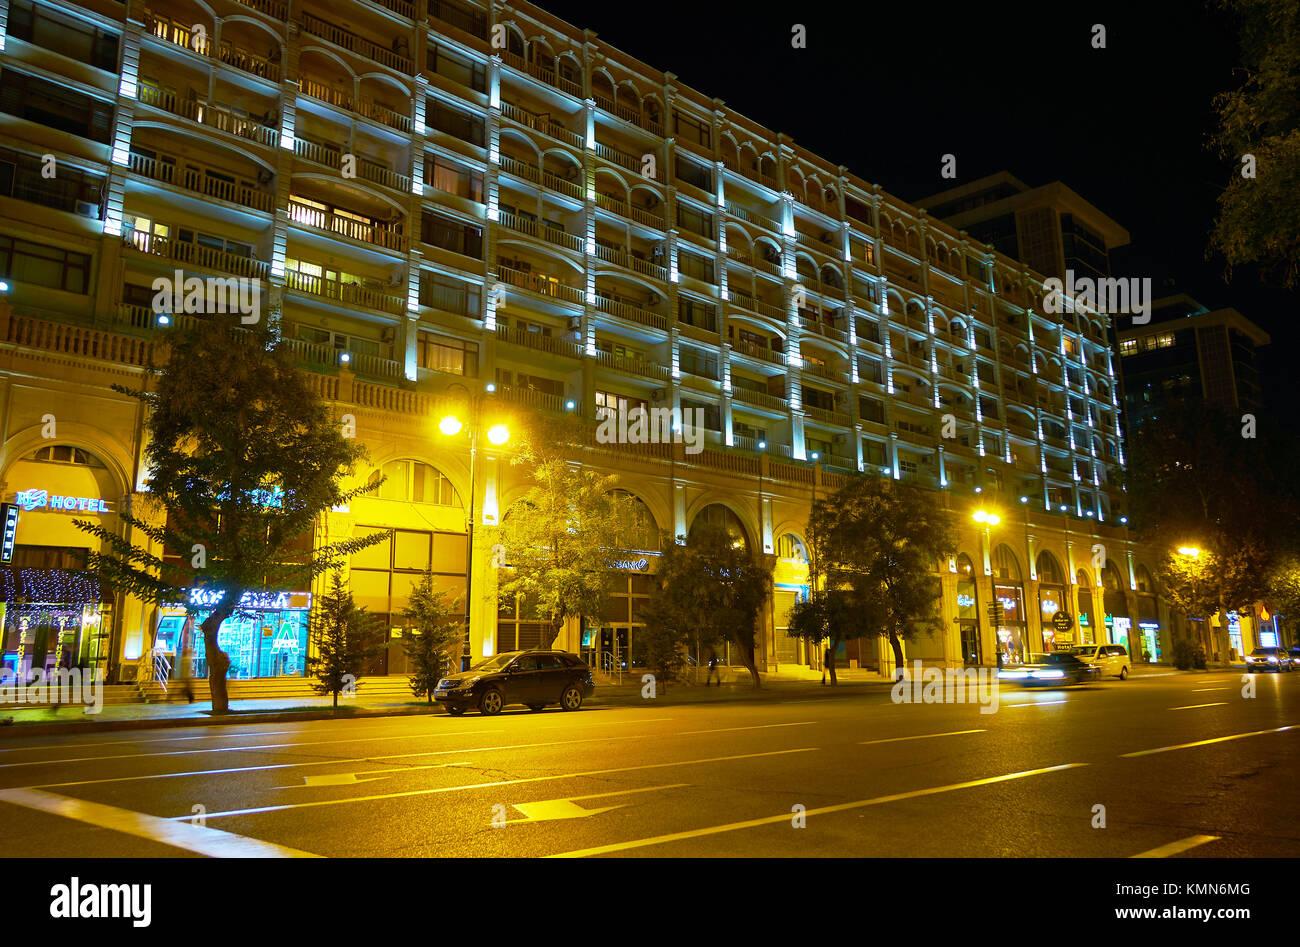 BAKU, AZERBAIJAN - OCTOBER 9, 2017: The scenic hotel edifice with arched balconies, on October 9 in Baku Stock Photo